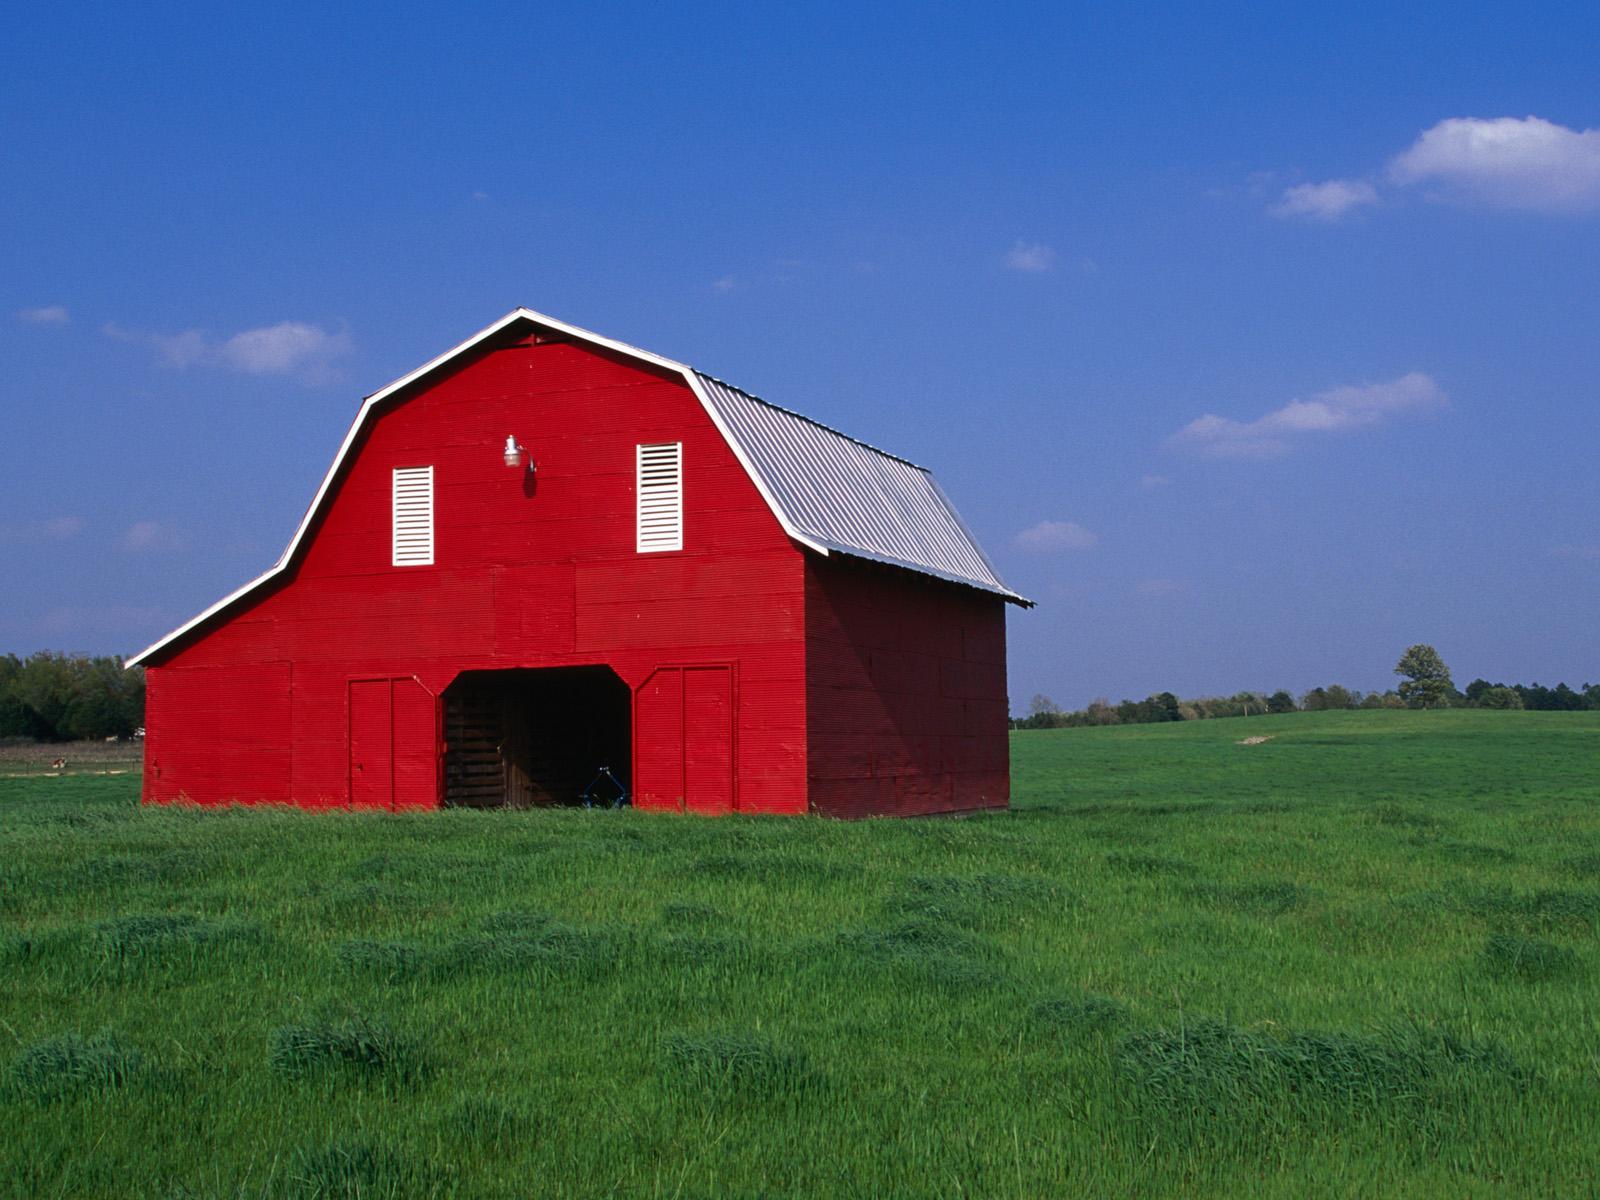 A classic in red.